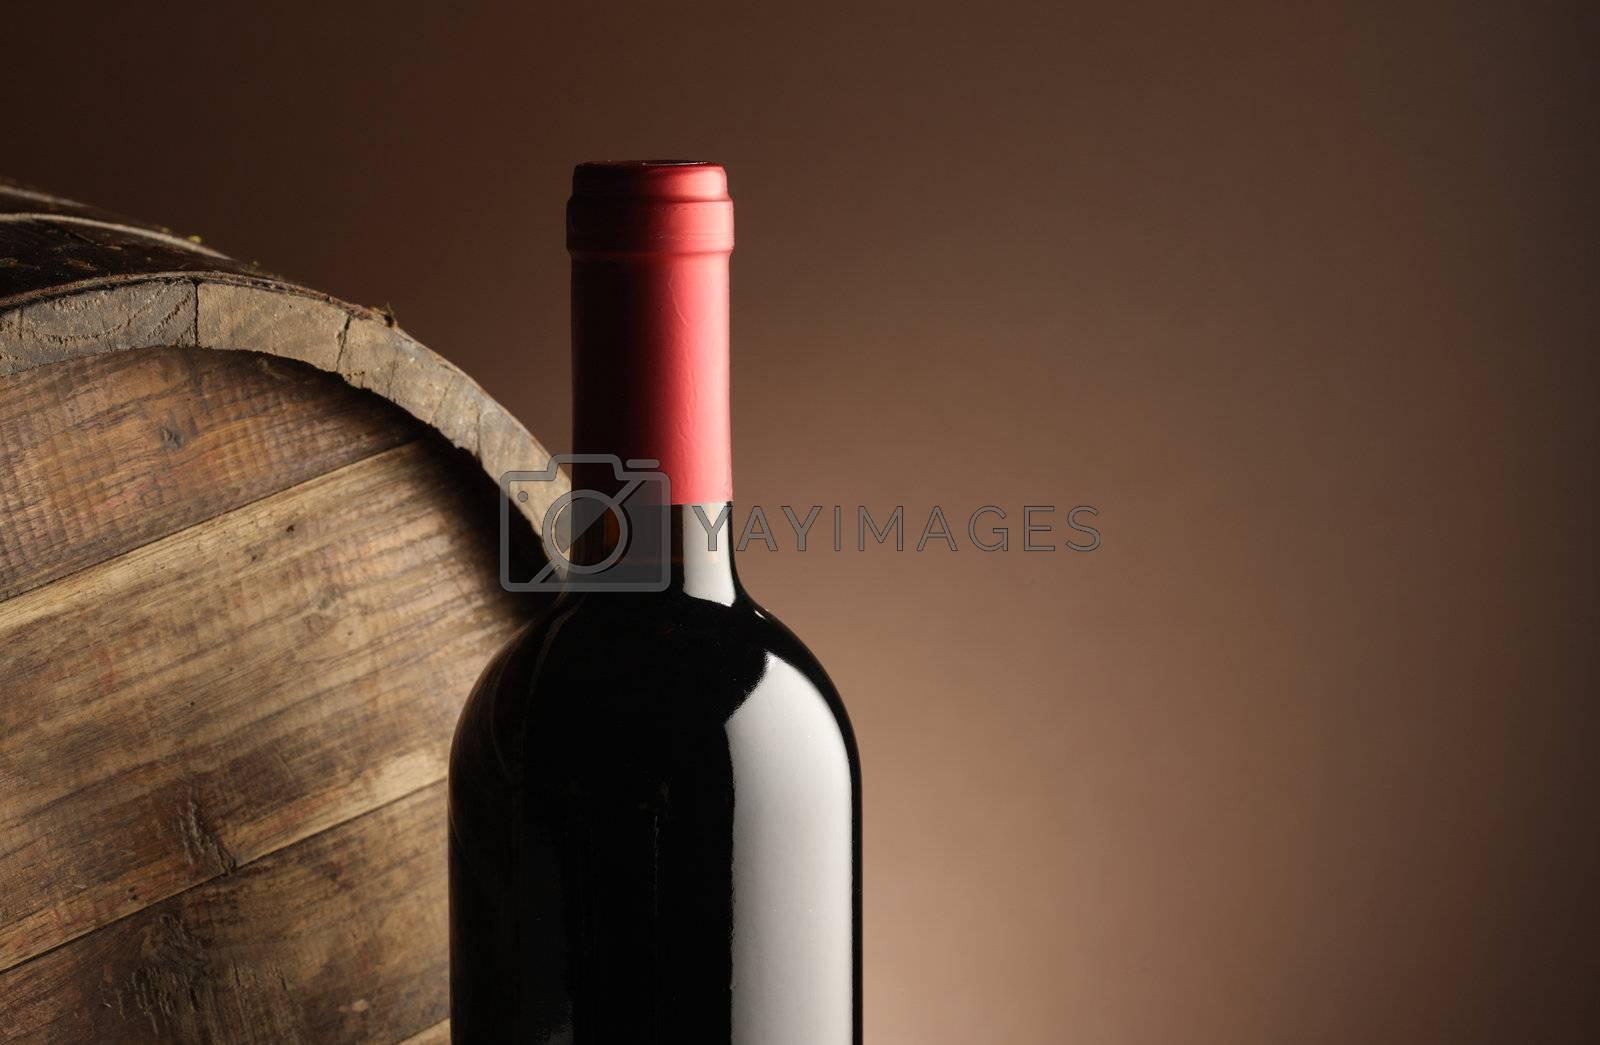 red wine bottle and wodden barrel